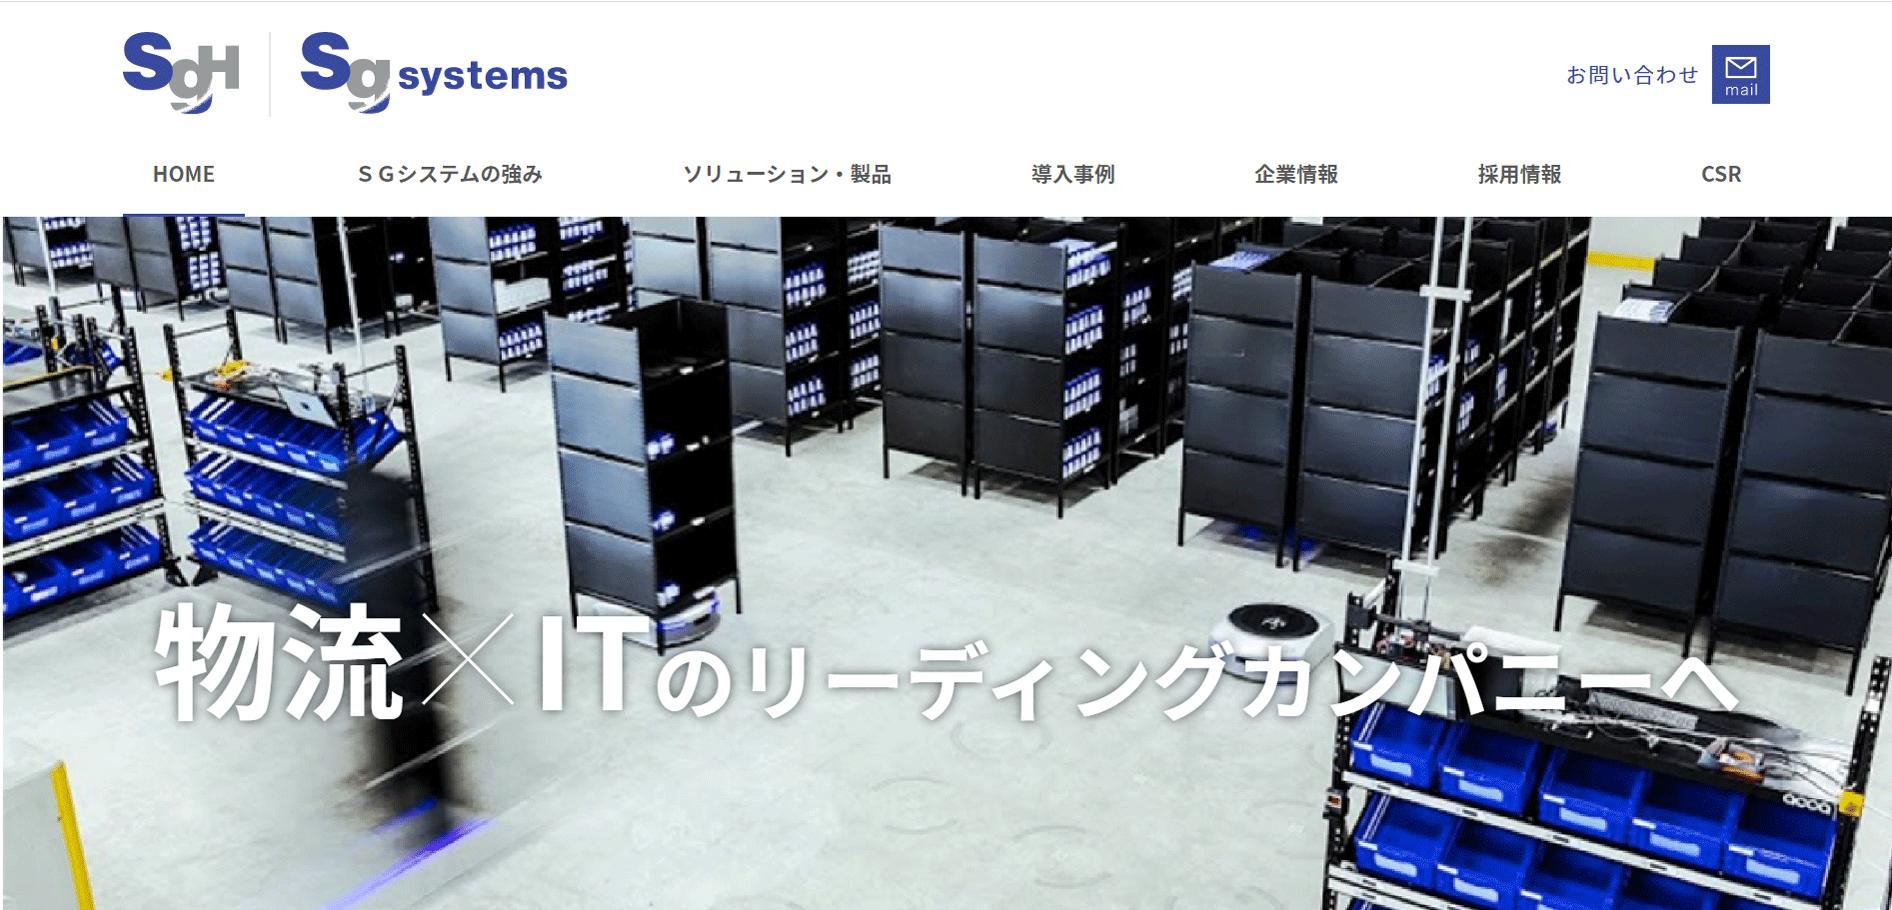 SGシステム株式会社のスクリーンショット